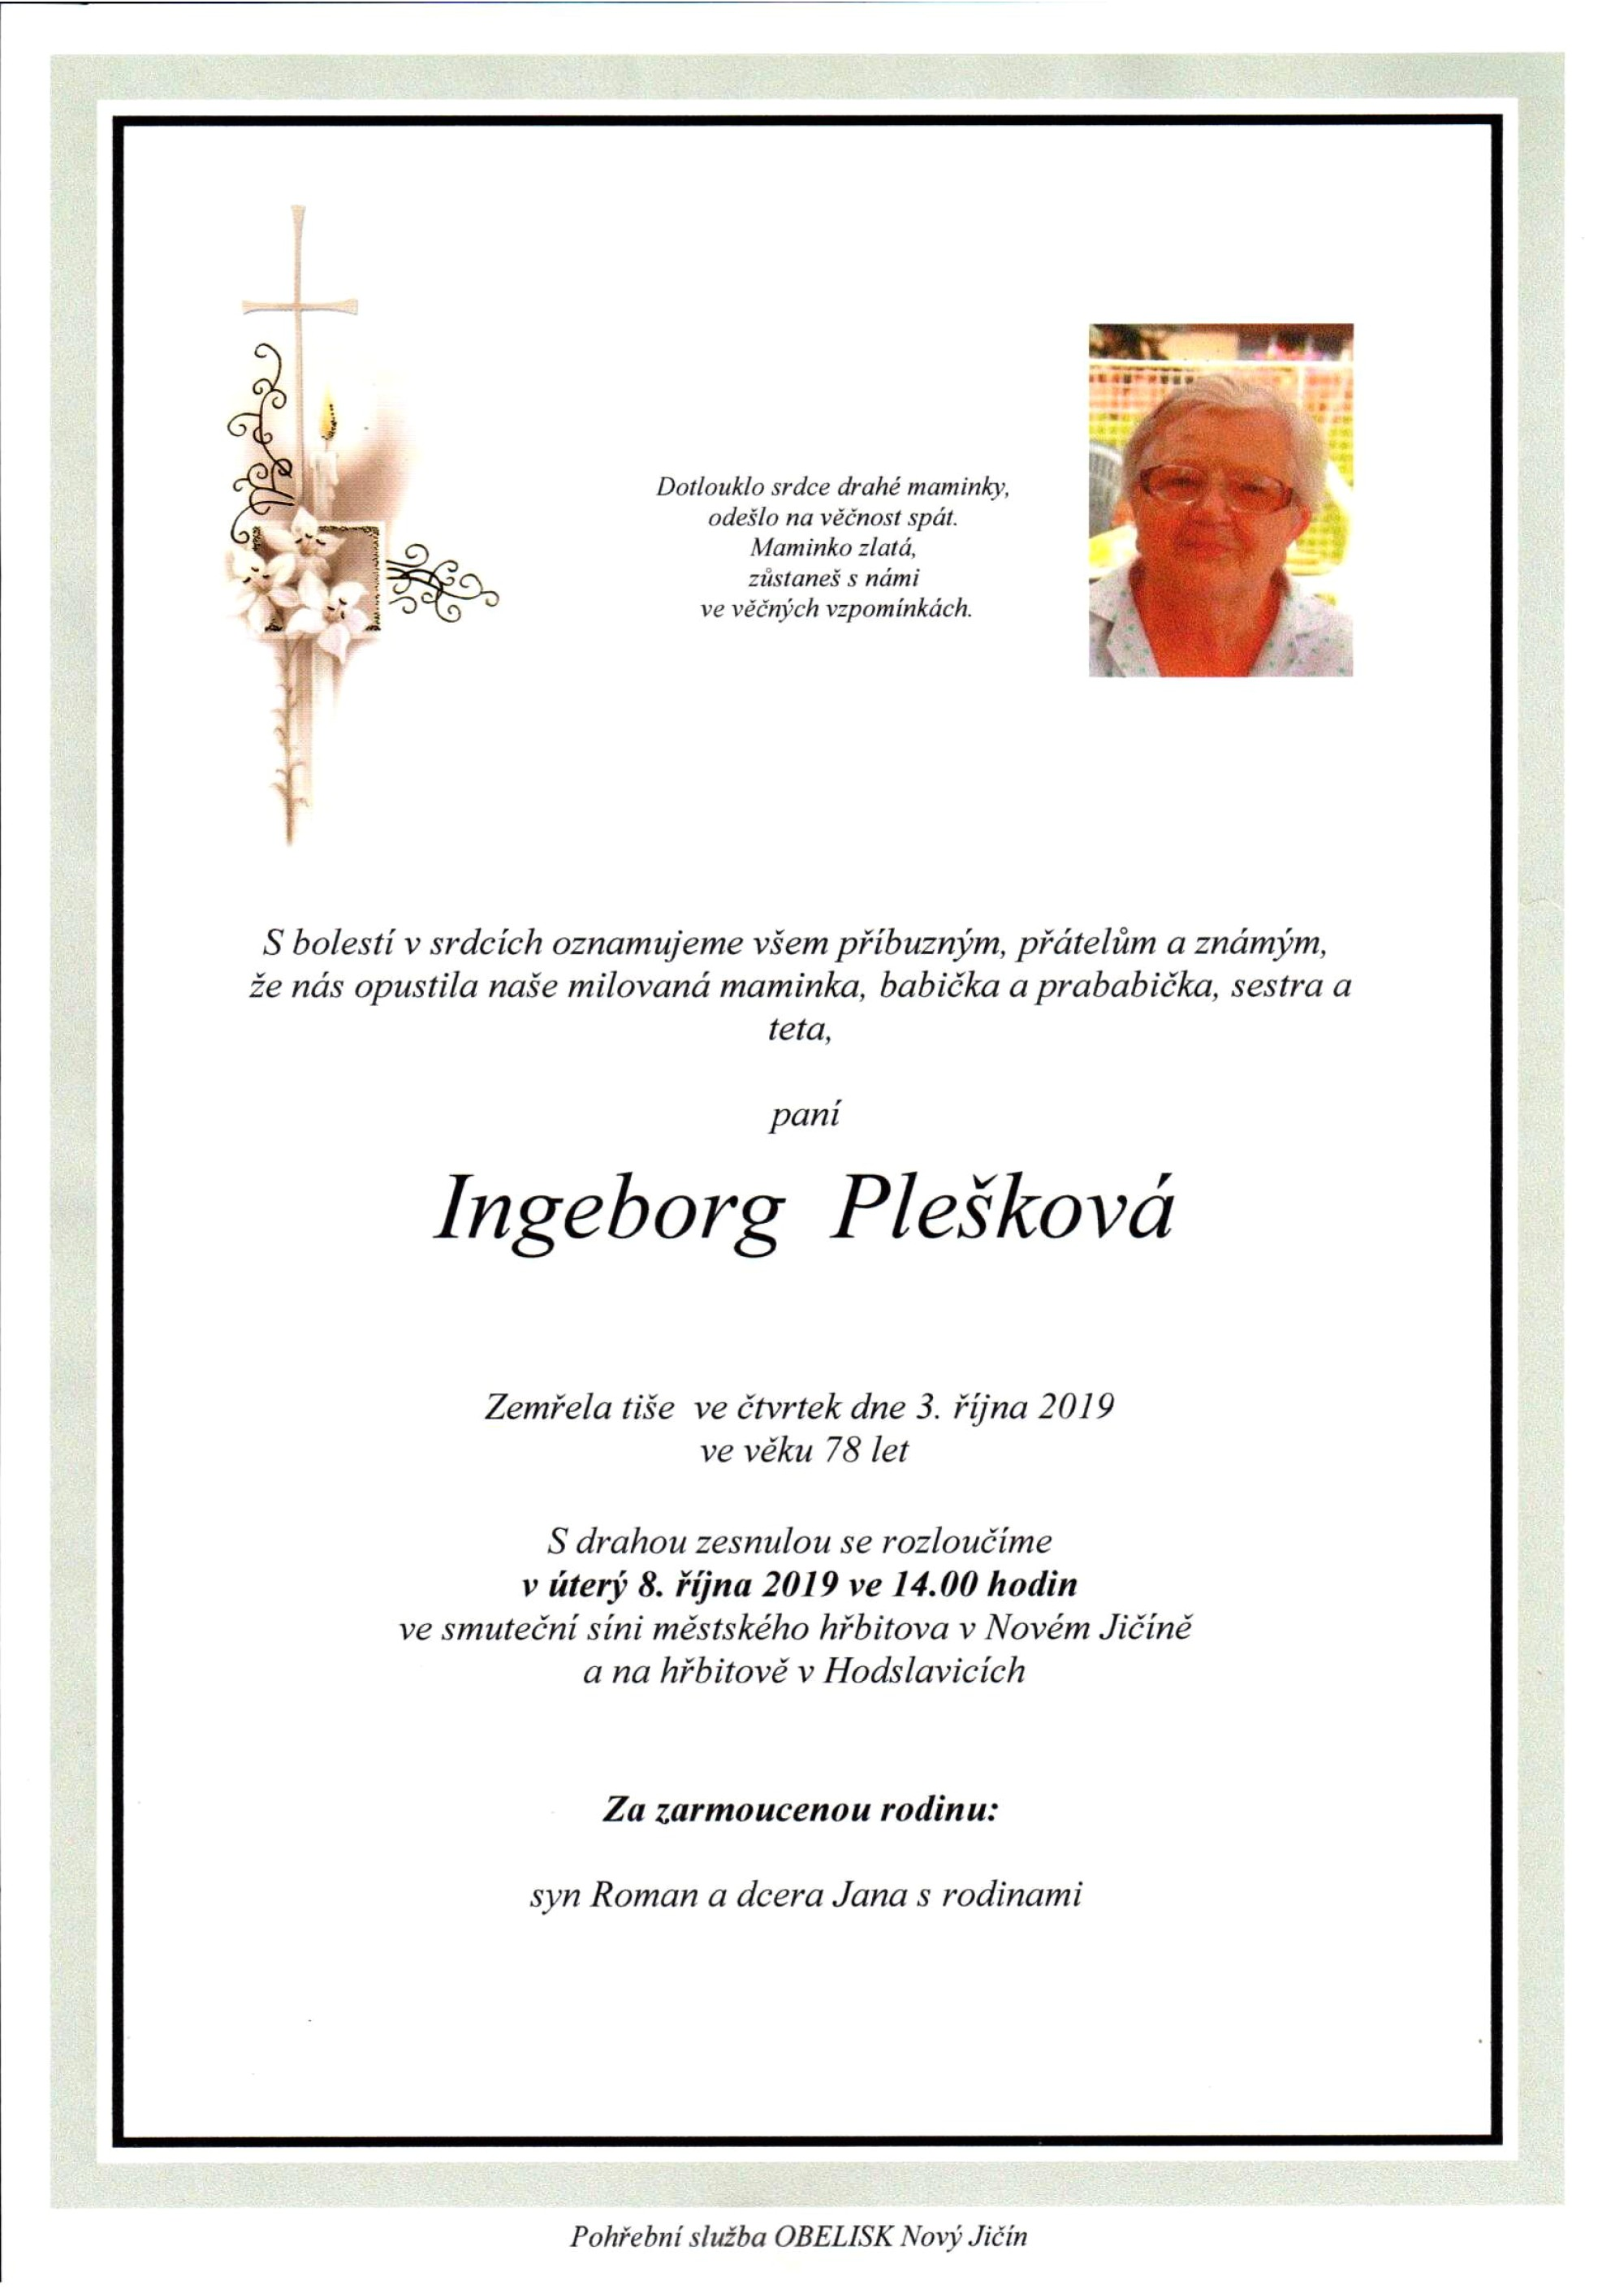 Ingeborg Plešková